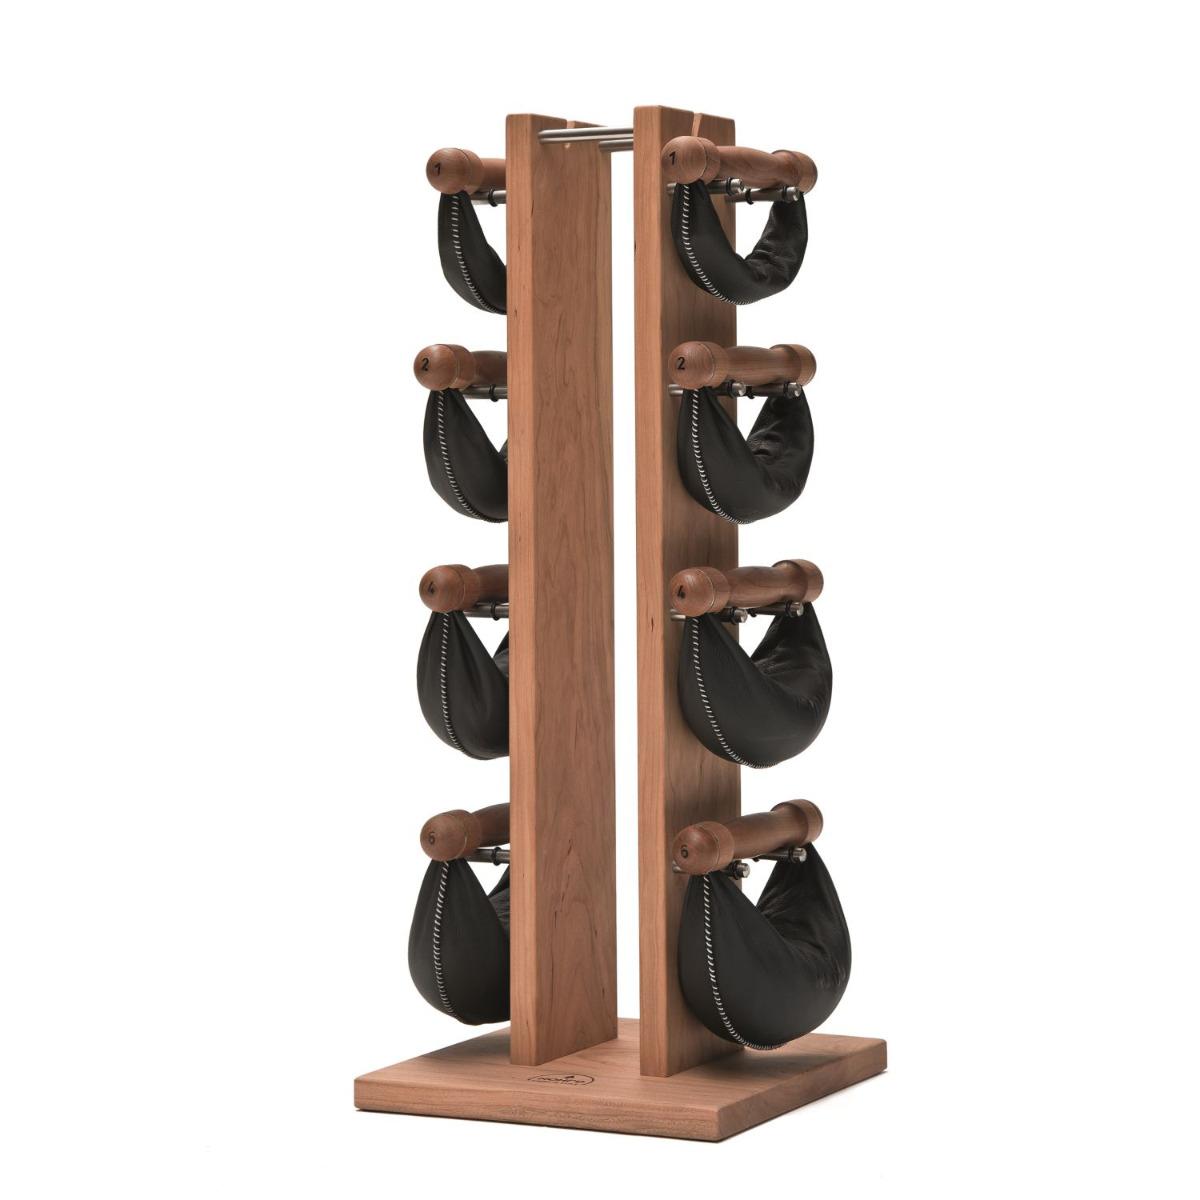 NOHrD Swing Bells & Tower Set - Cherry (Oxbridge)